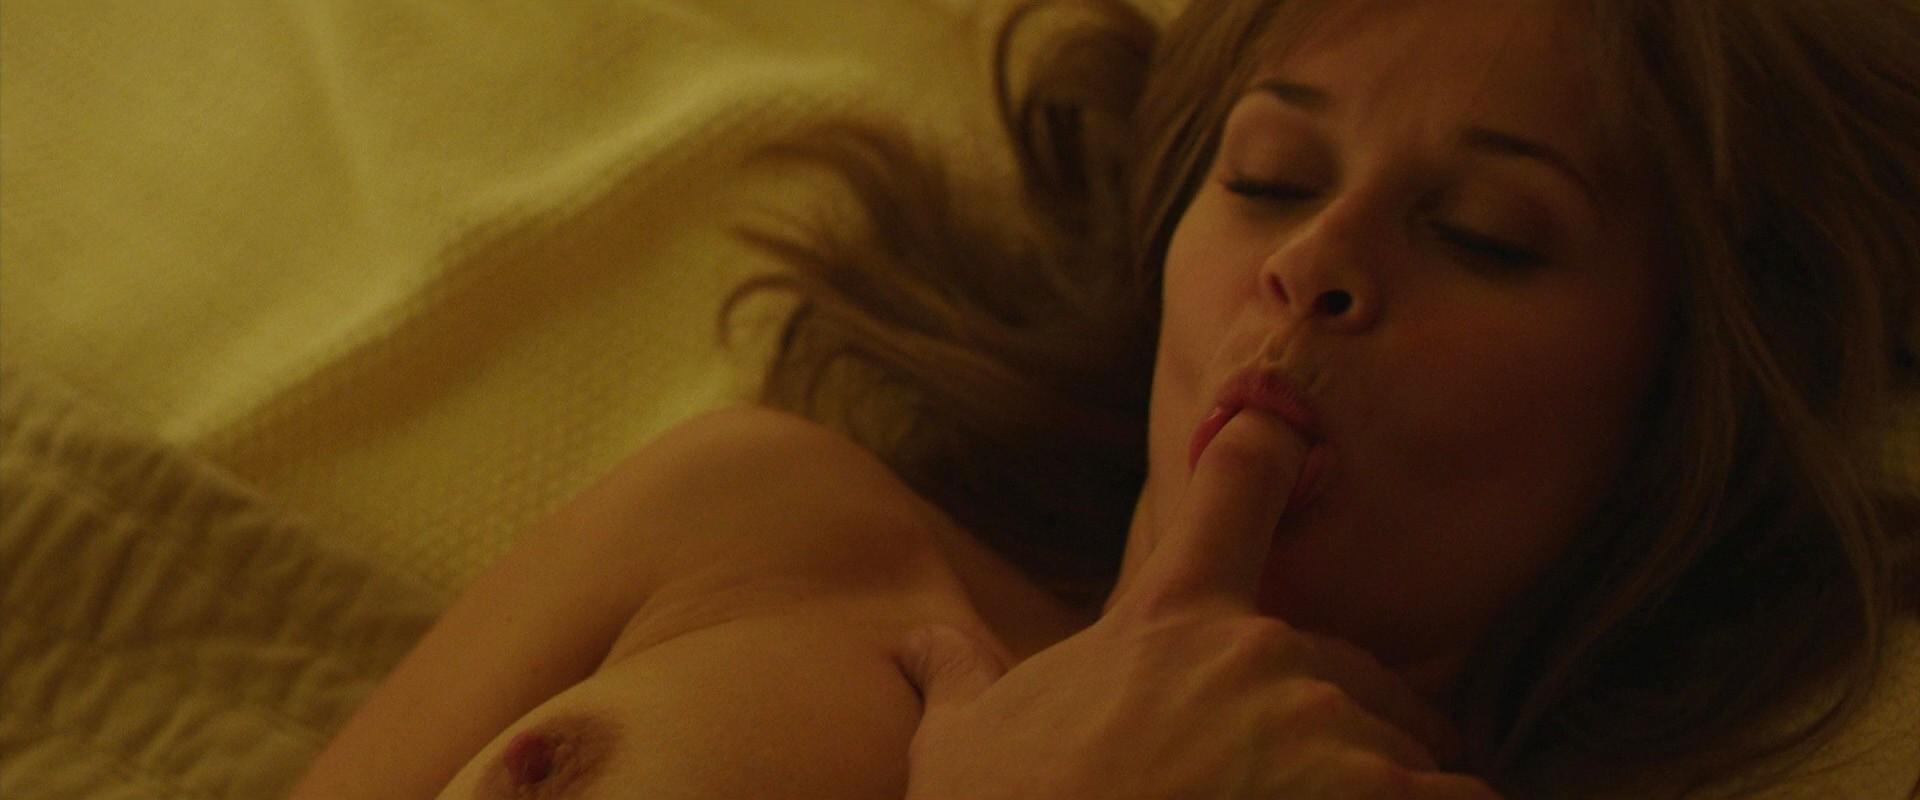 Reese Witherspoon Desnuda Fotos Y Vídeos Imperiodefamosas